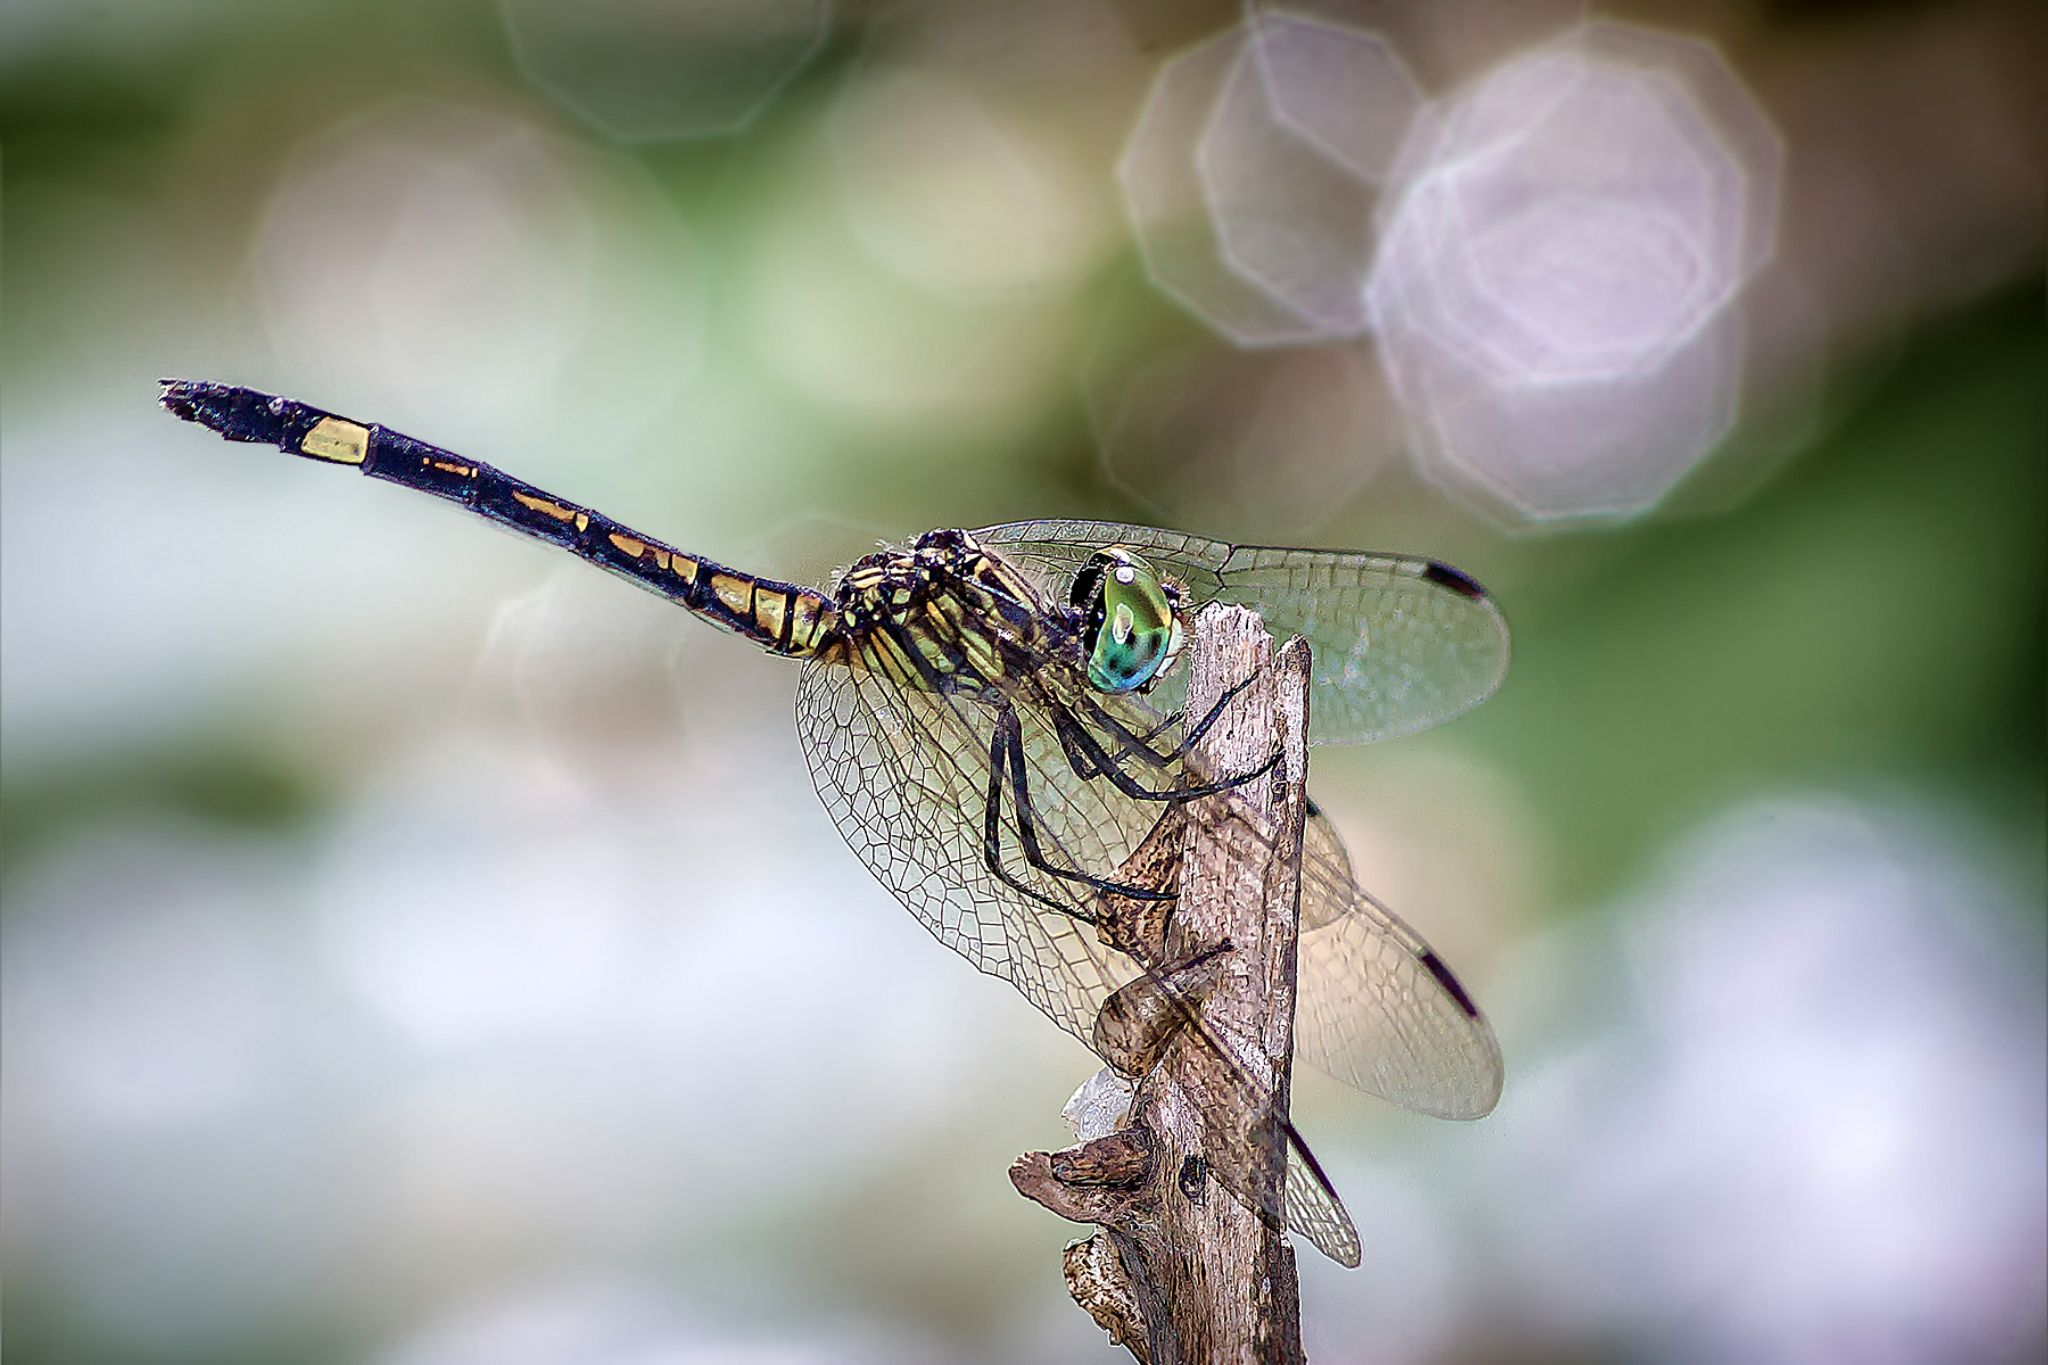 Green Dragonfly 02 by Tony Guzman